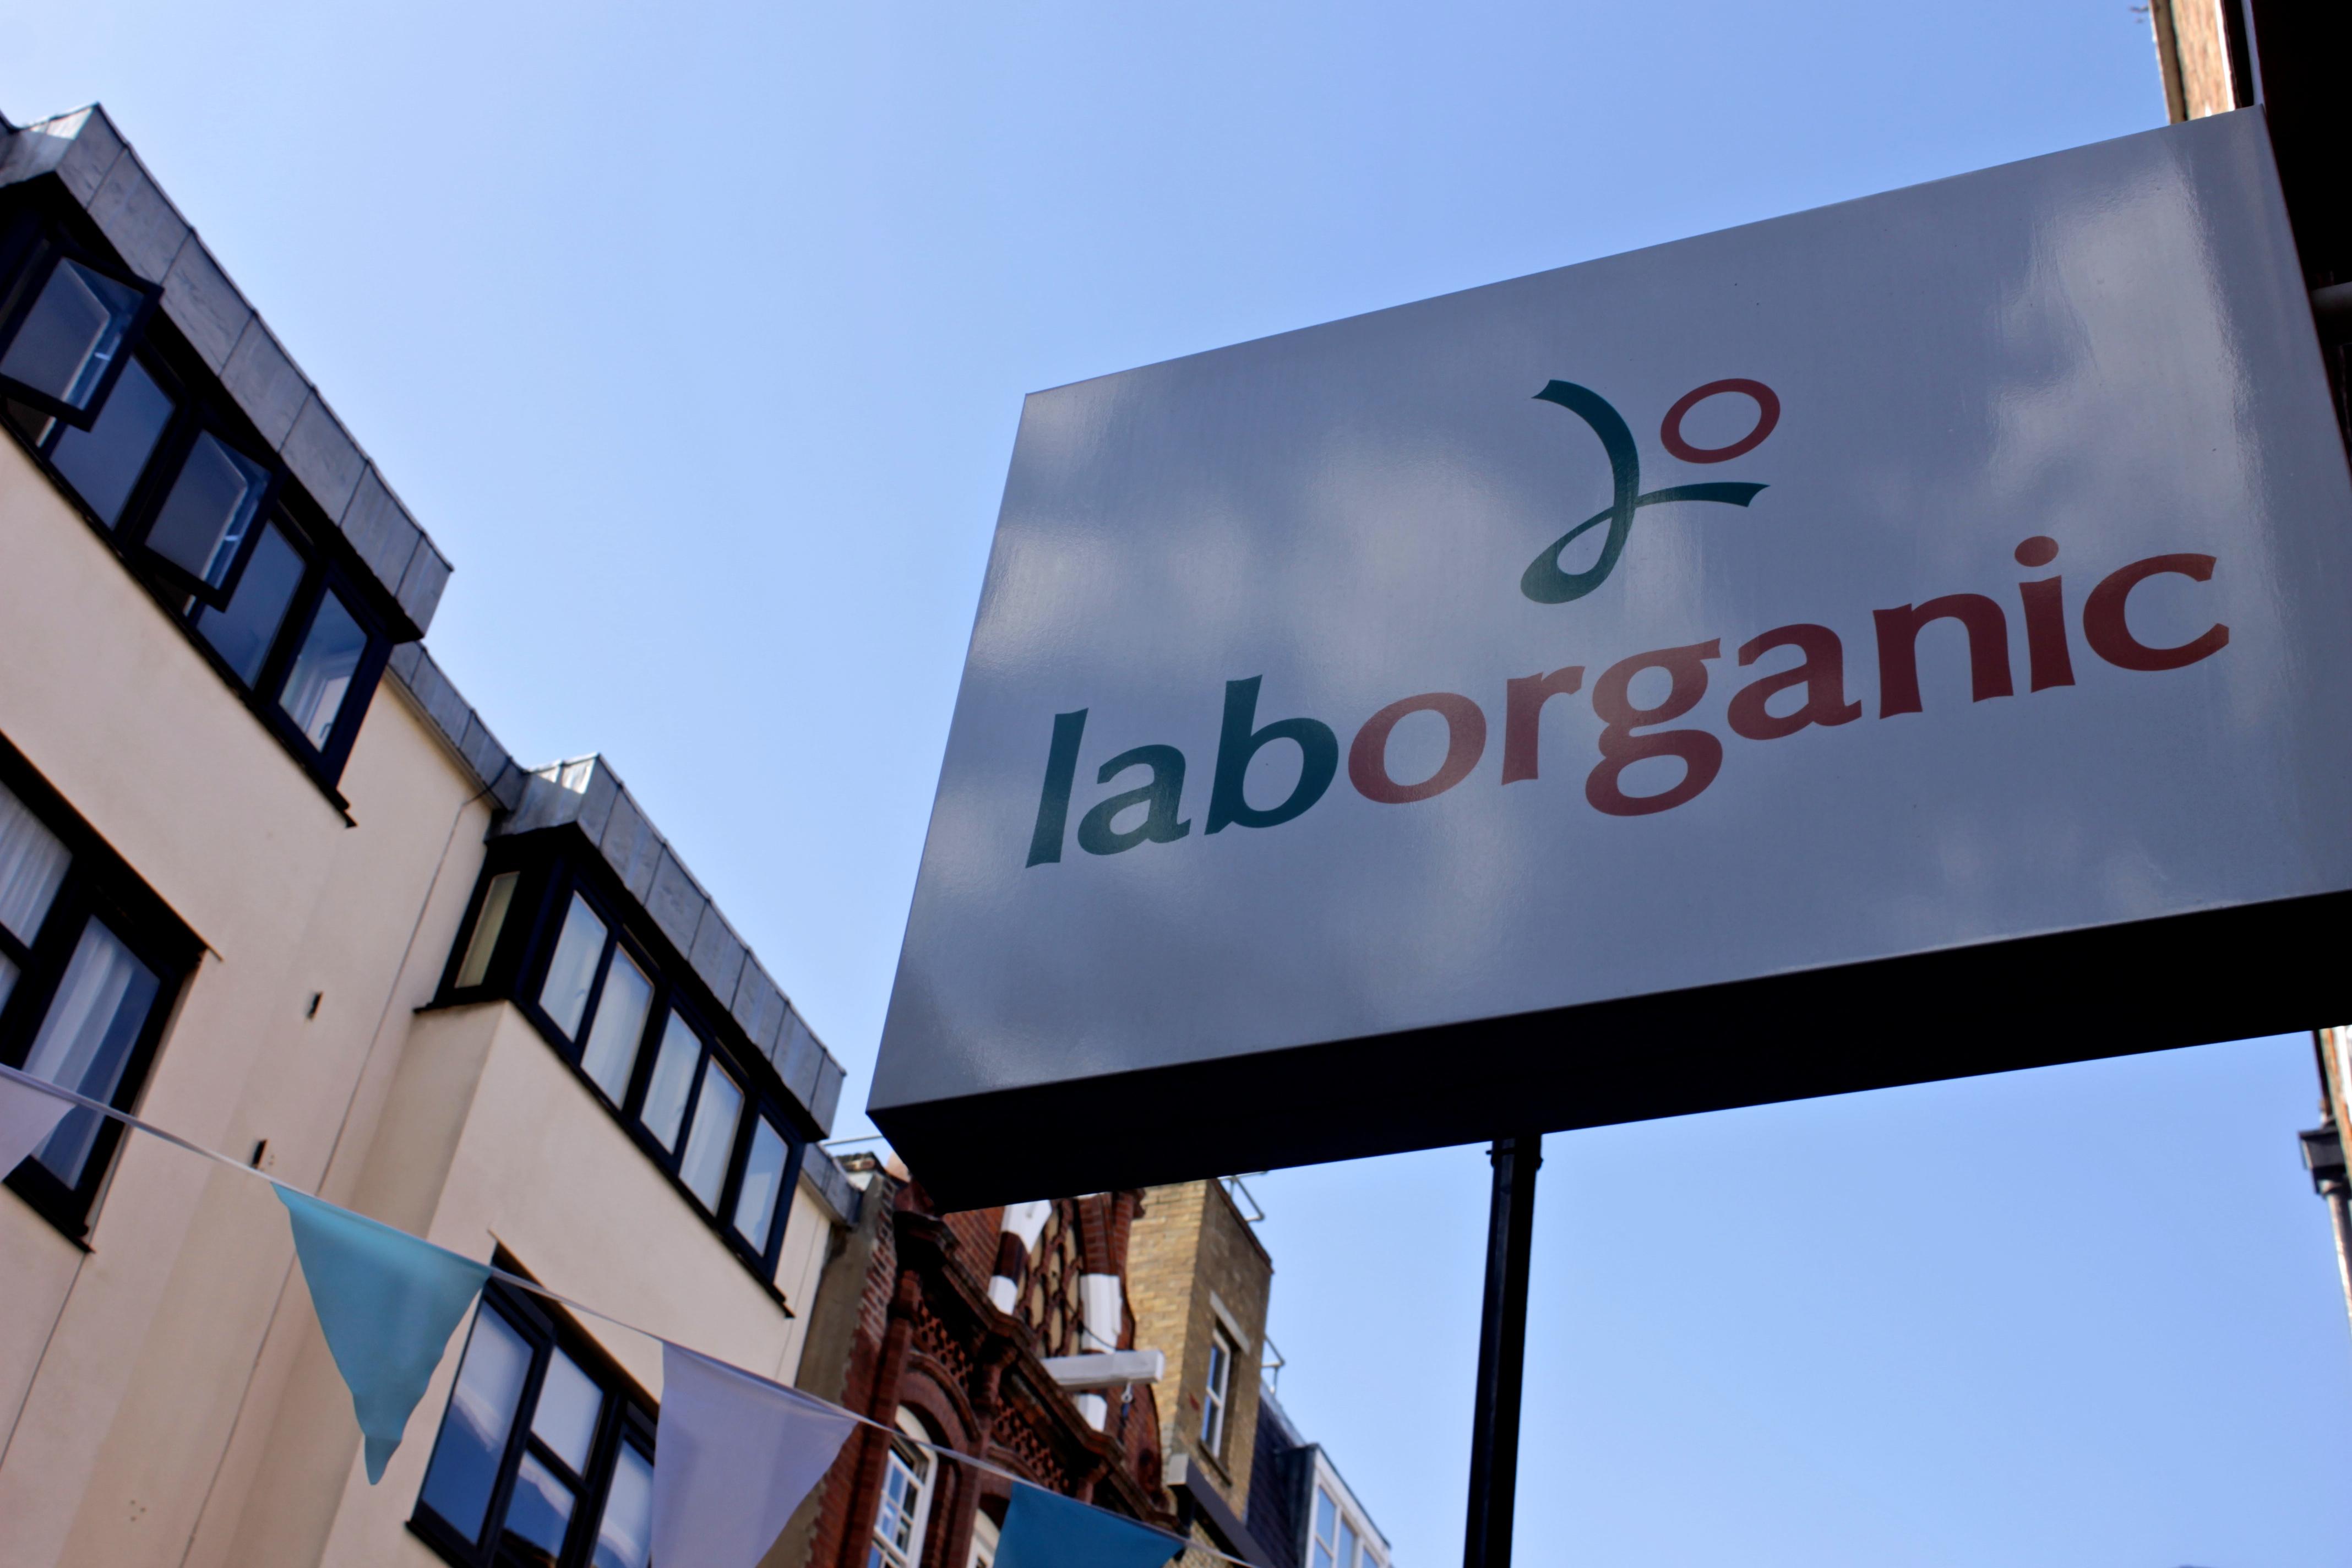 Lab Organic